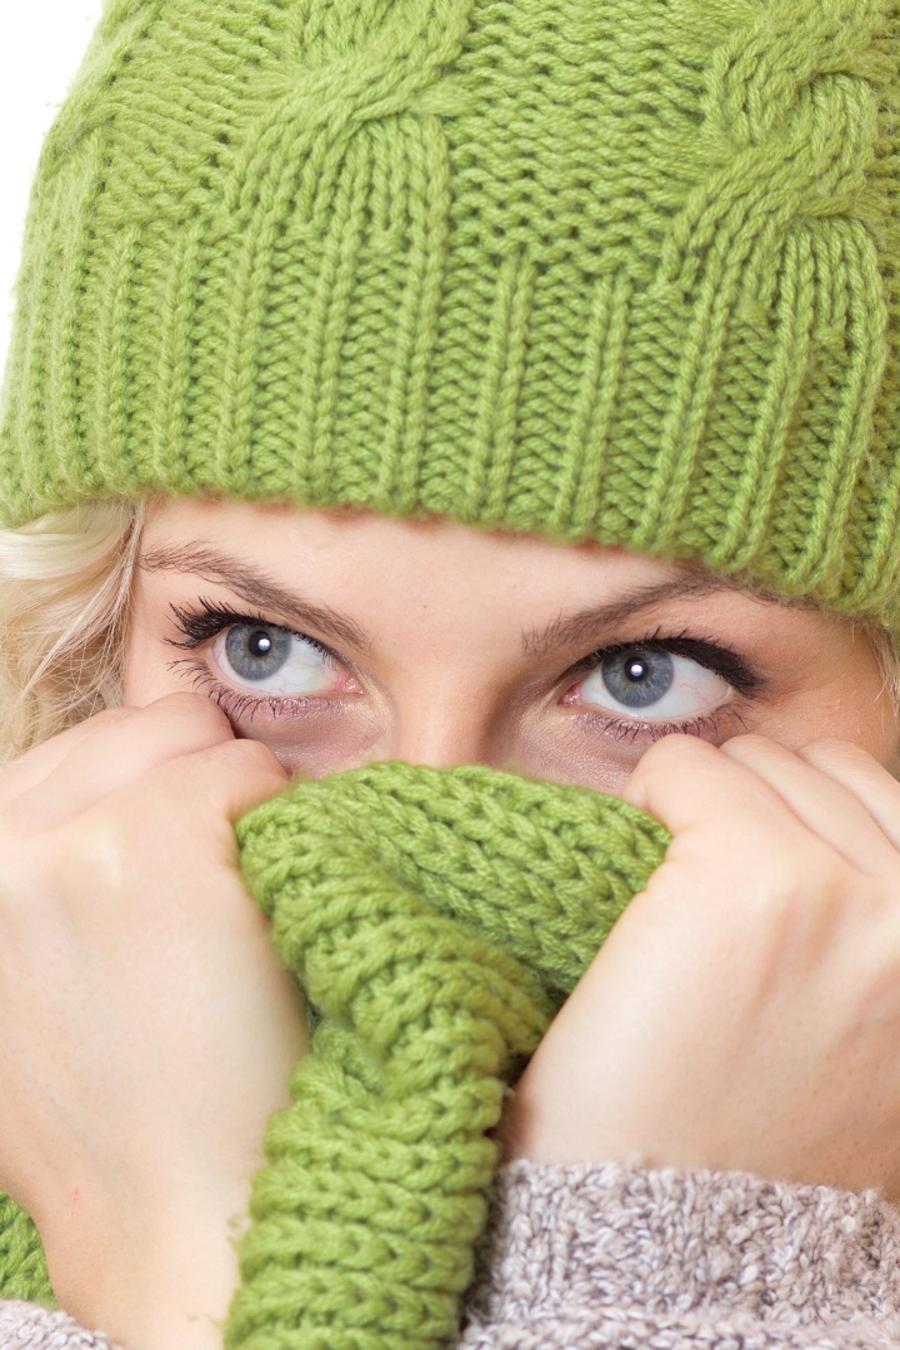 Mujer rubia con sweater, gorro y bufanda de lana